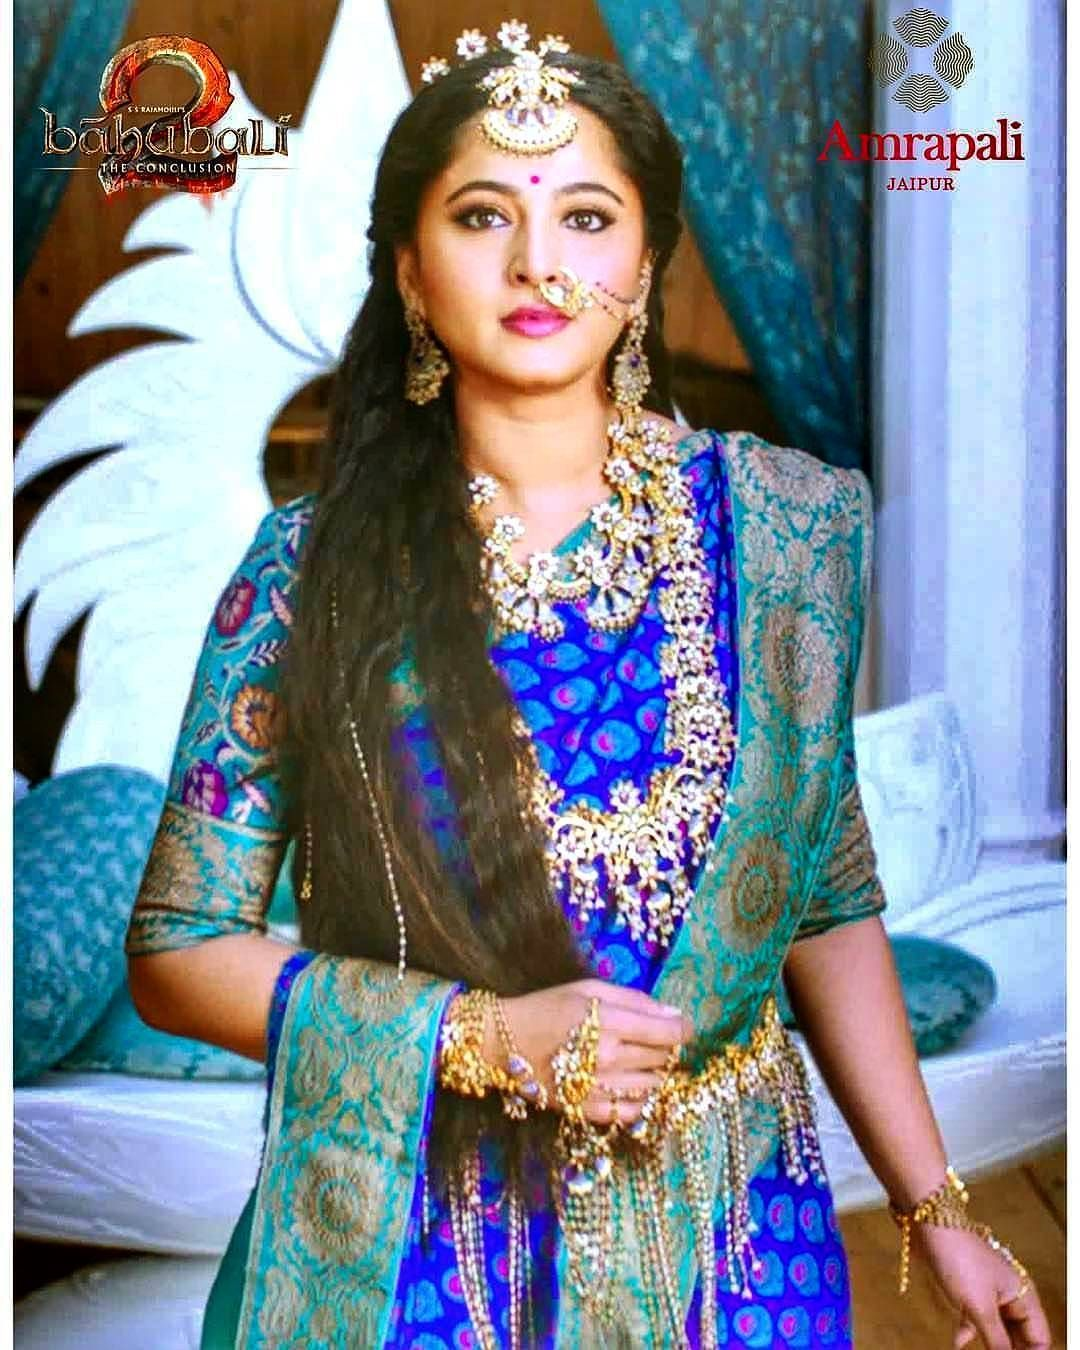 Anushkashettymysoul On Instagram The Royal Queen Devasena Bahubali2 Anushkashetty Anushkashetty Wedding Saree Collection Indian Dresses Saree Designs